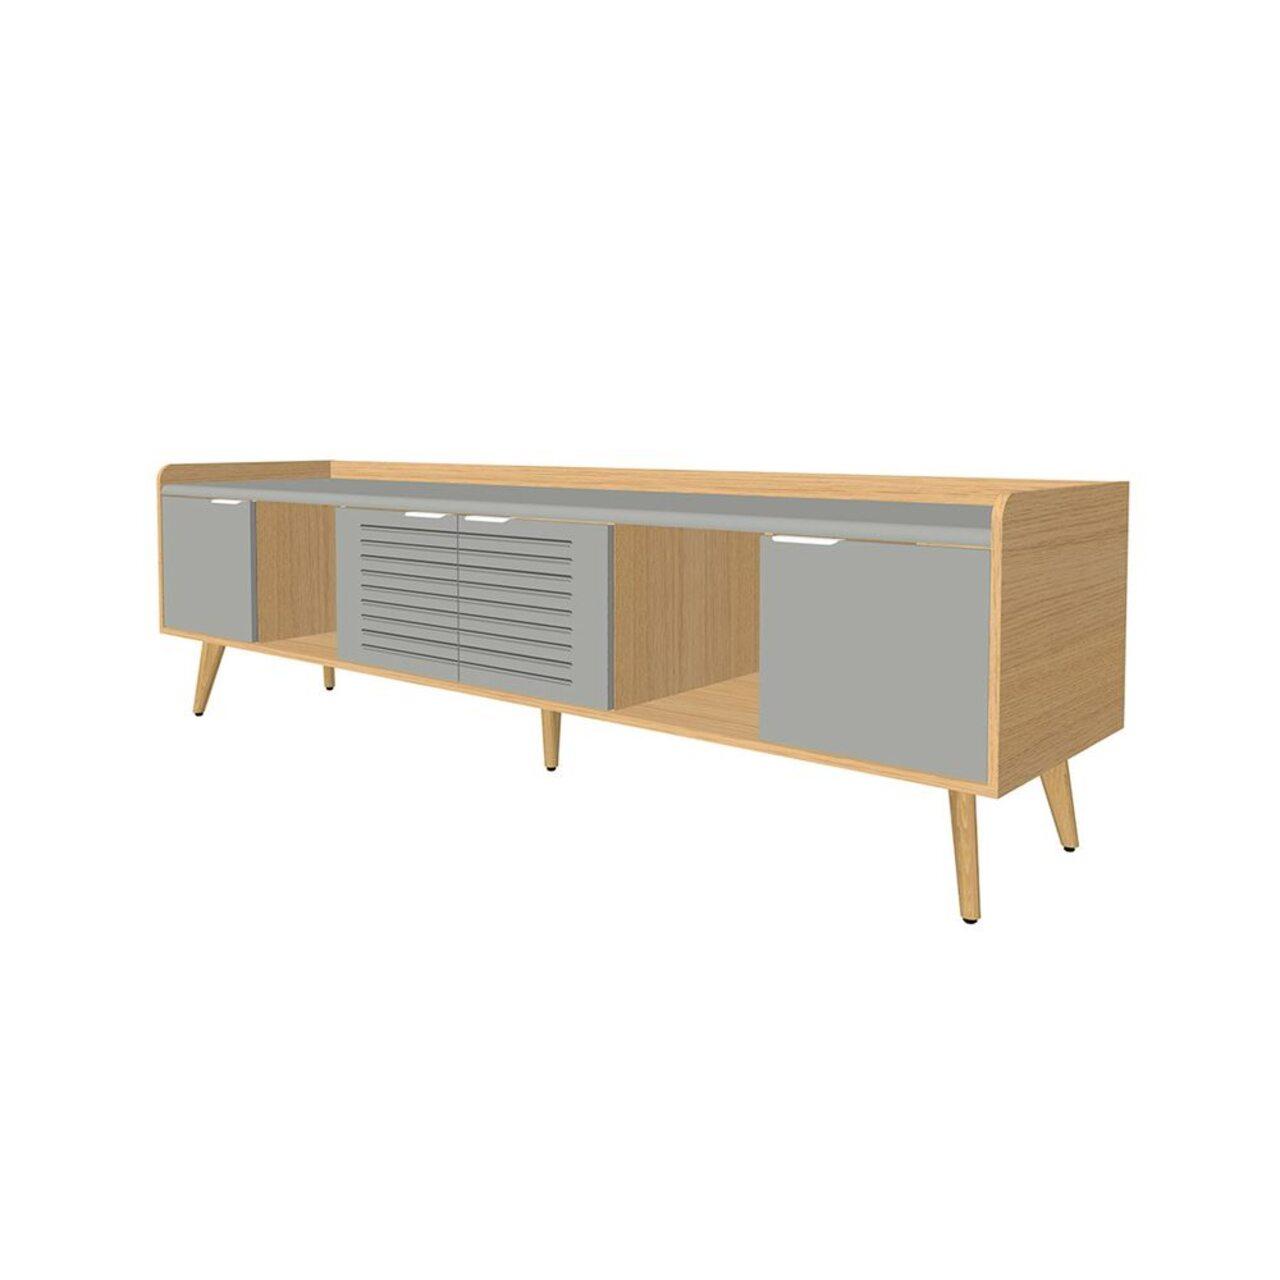 Тумба опорная для конференц-стола (3 отделения)  Remo 55x223x65 - фото 3